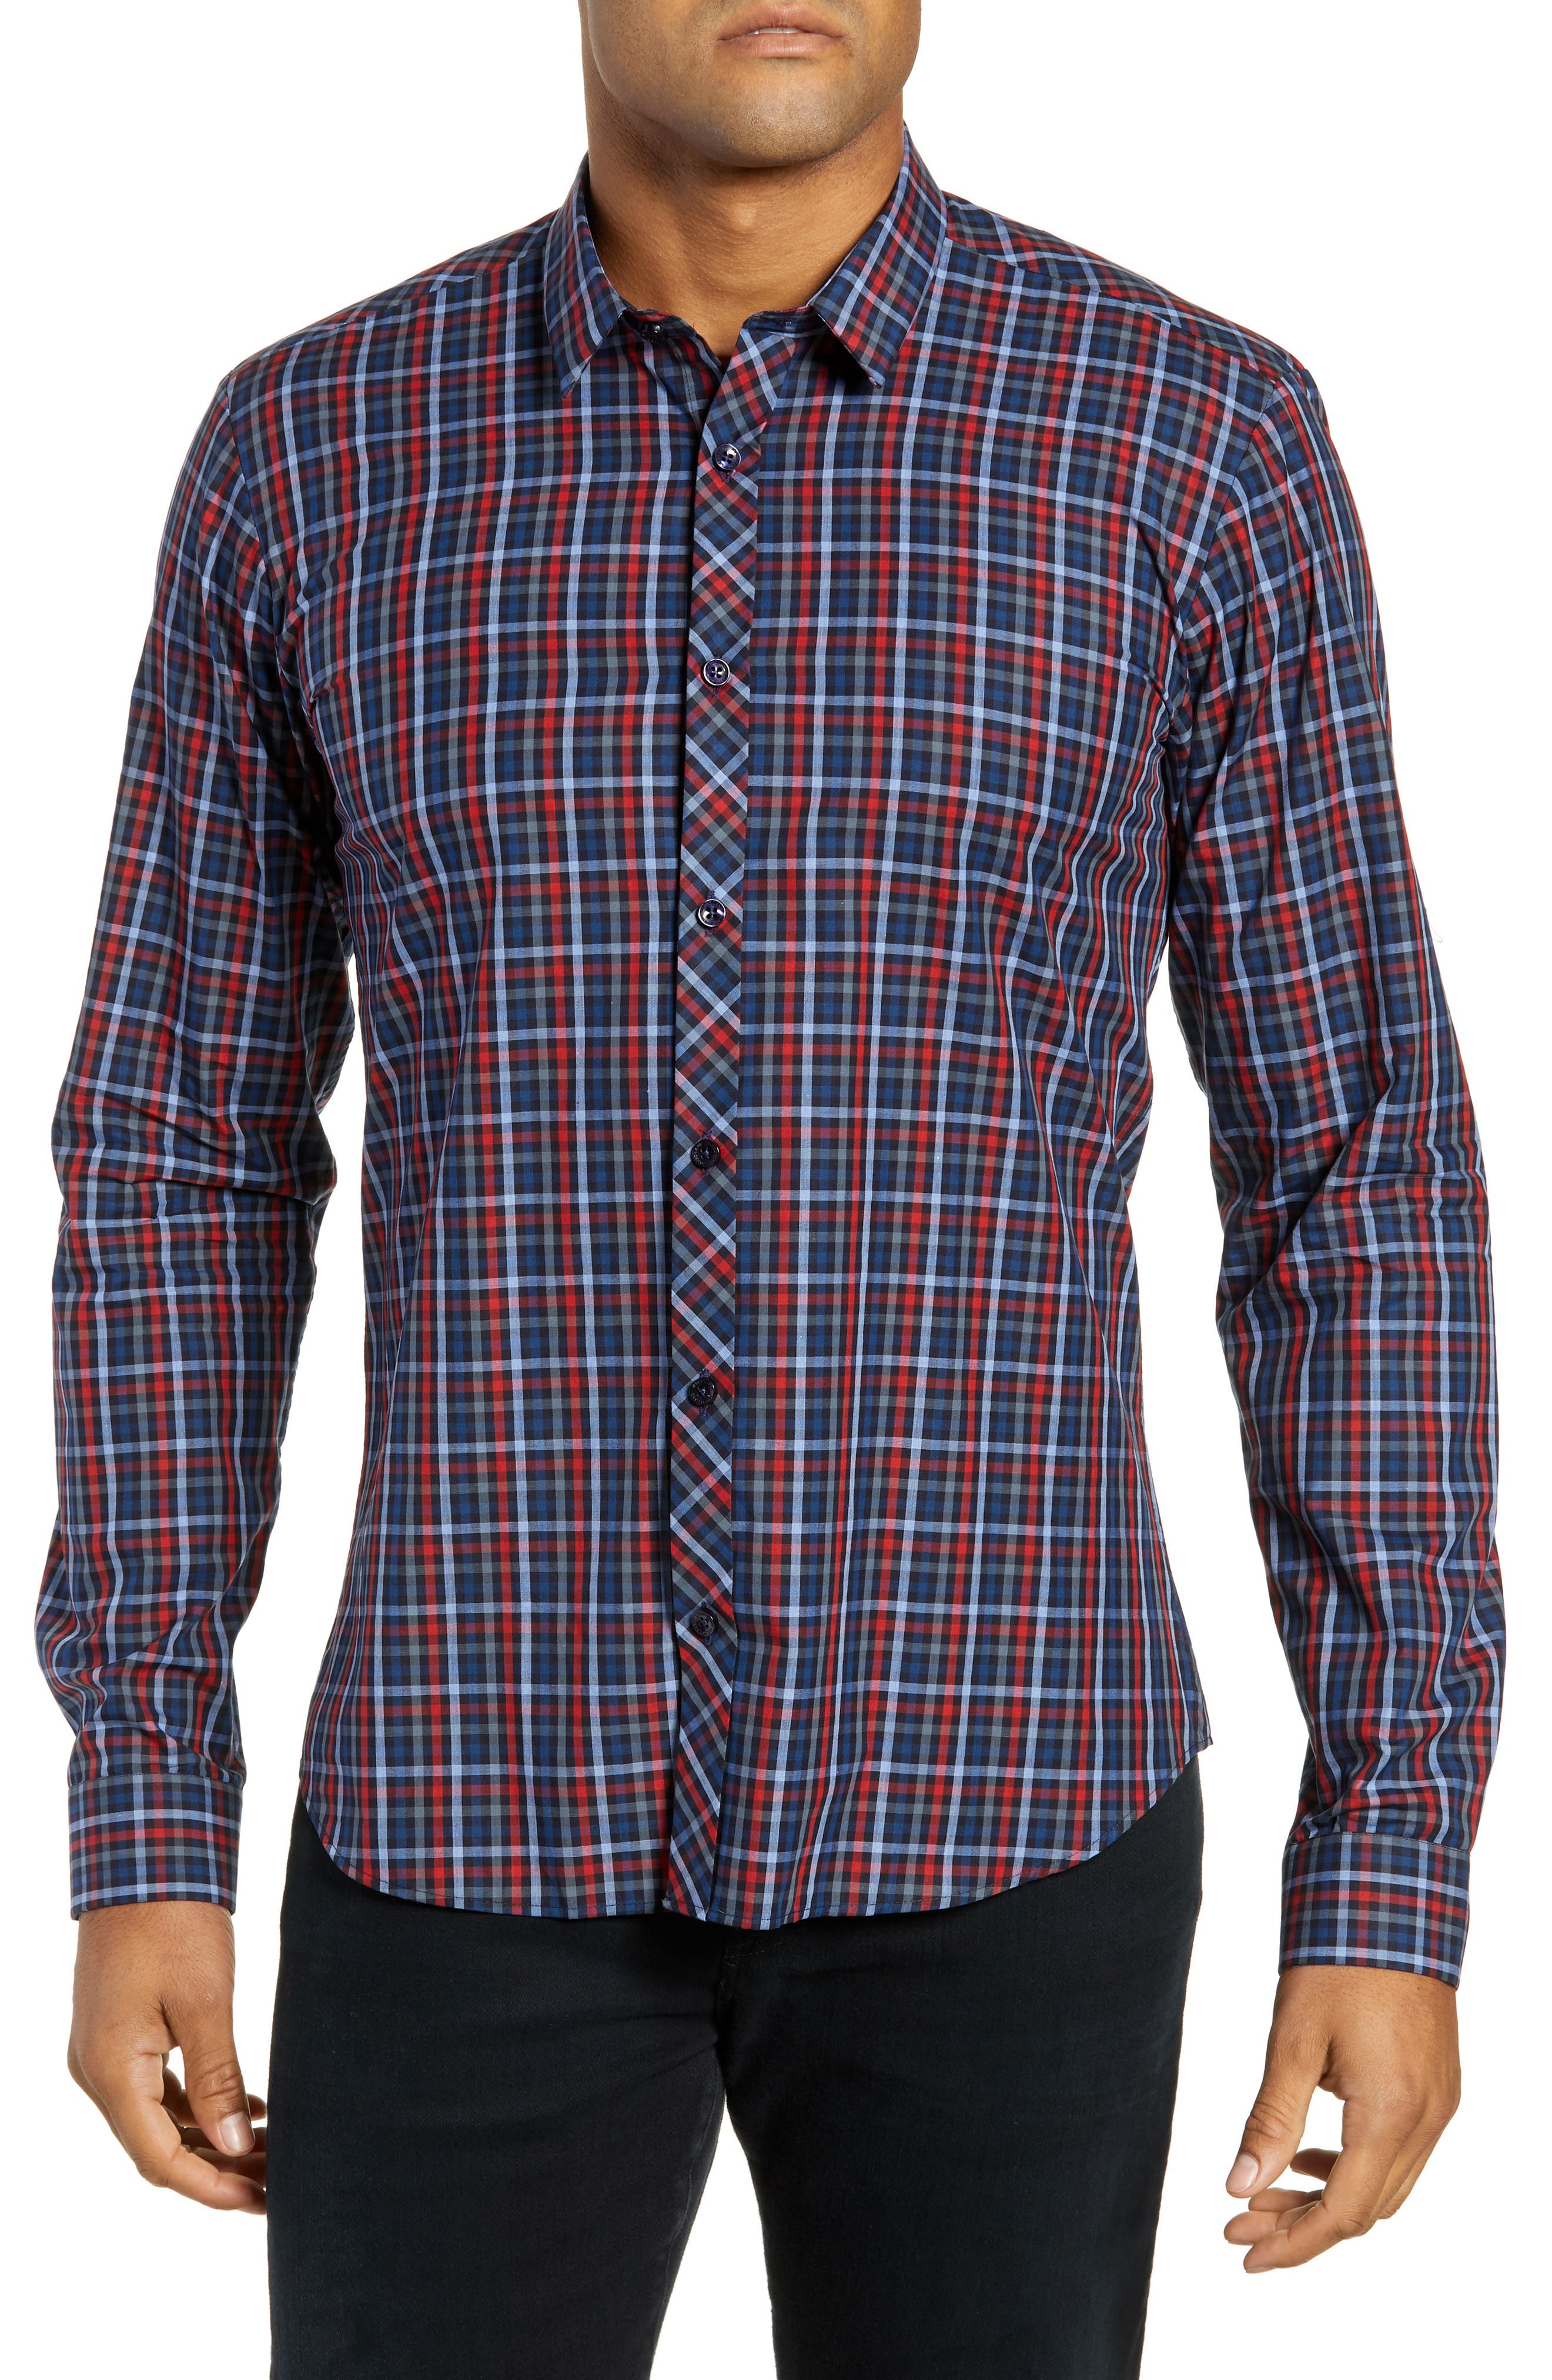 Trim Fit Sport Shirt,                             Main thumbnail 1, color,                             RED - BLUE MULTI CHECK